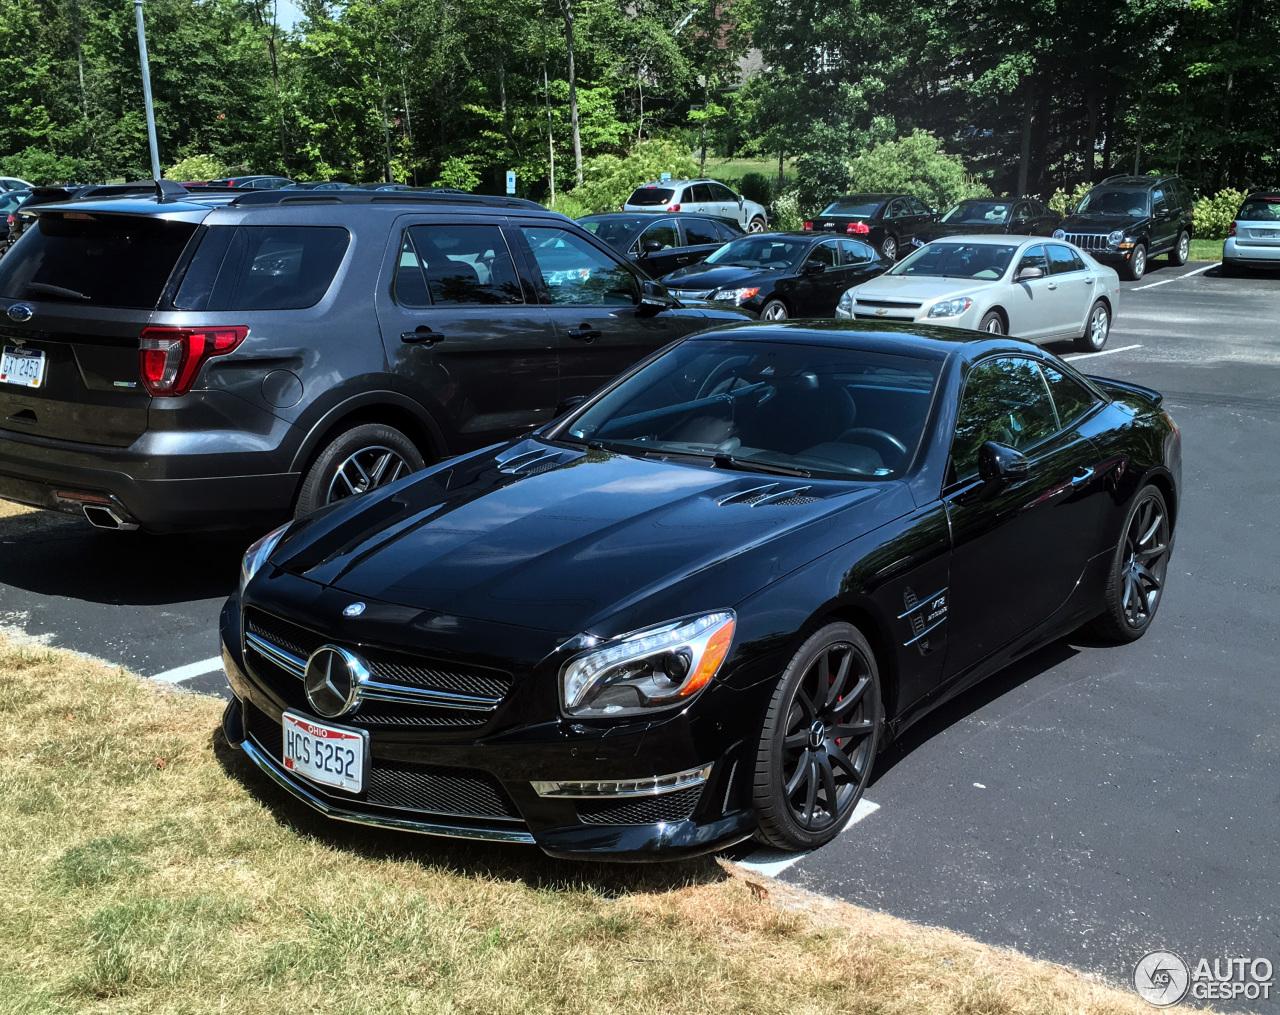 Mercedes benz sl 65 amg r231 21 june 2017 autogespot for Mercedes benz 65 amg